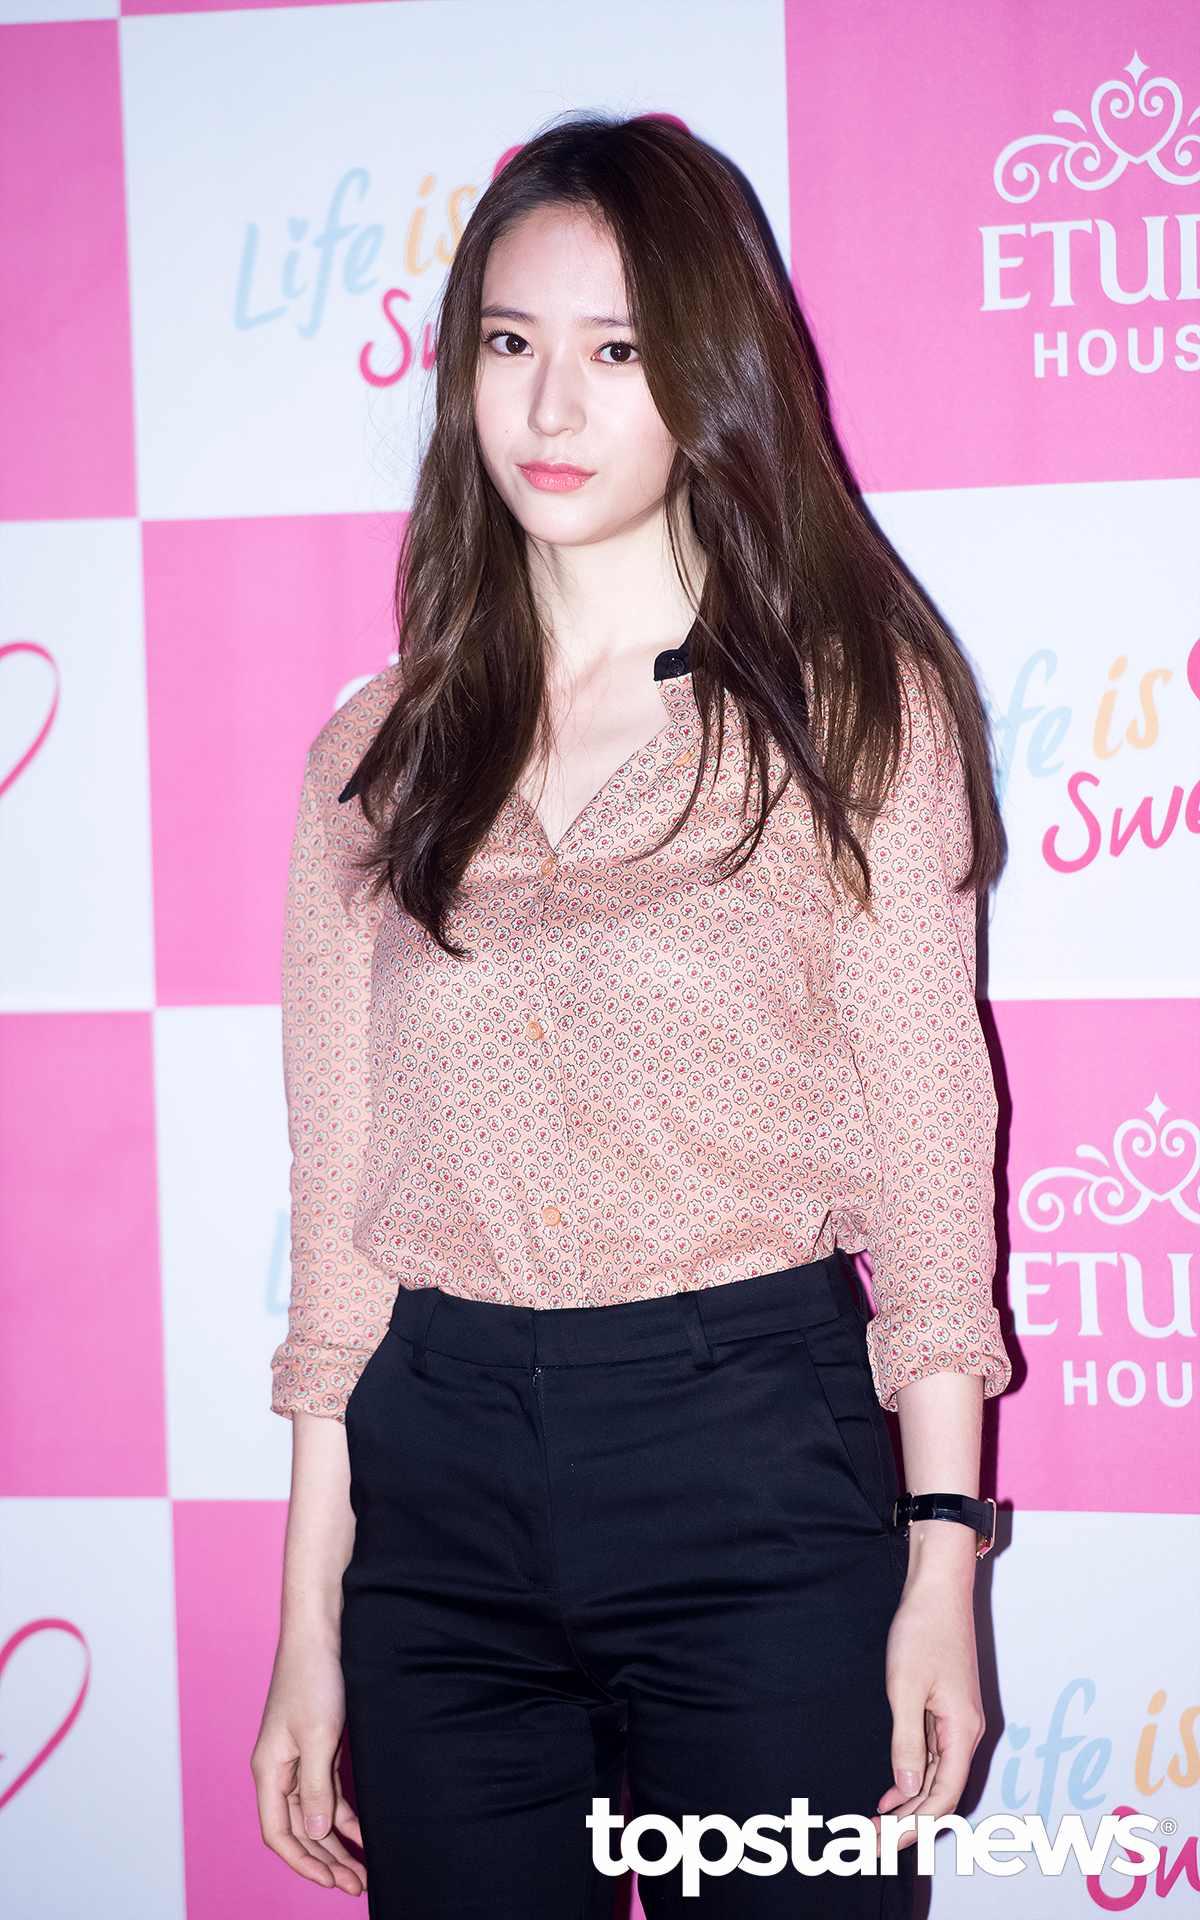 Krystal是冷美女的代表~ CHIC和性感有時散發出可愛魅力讓人陷入其中 在女生看來都是女神級人物啊~!!!